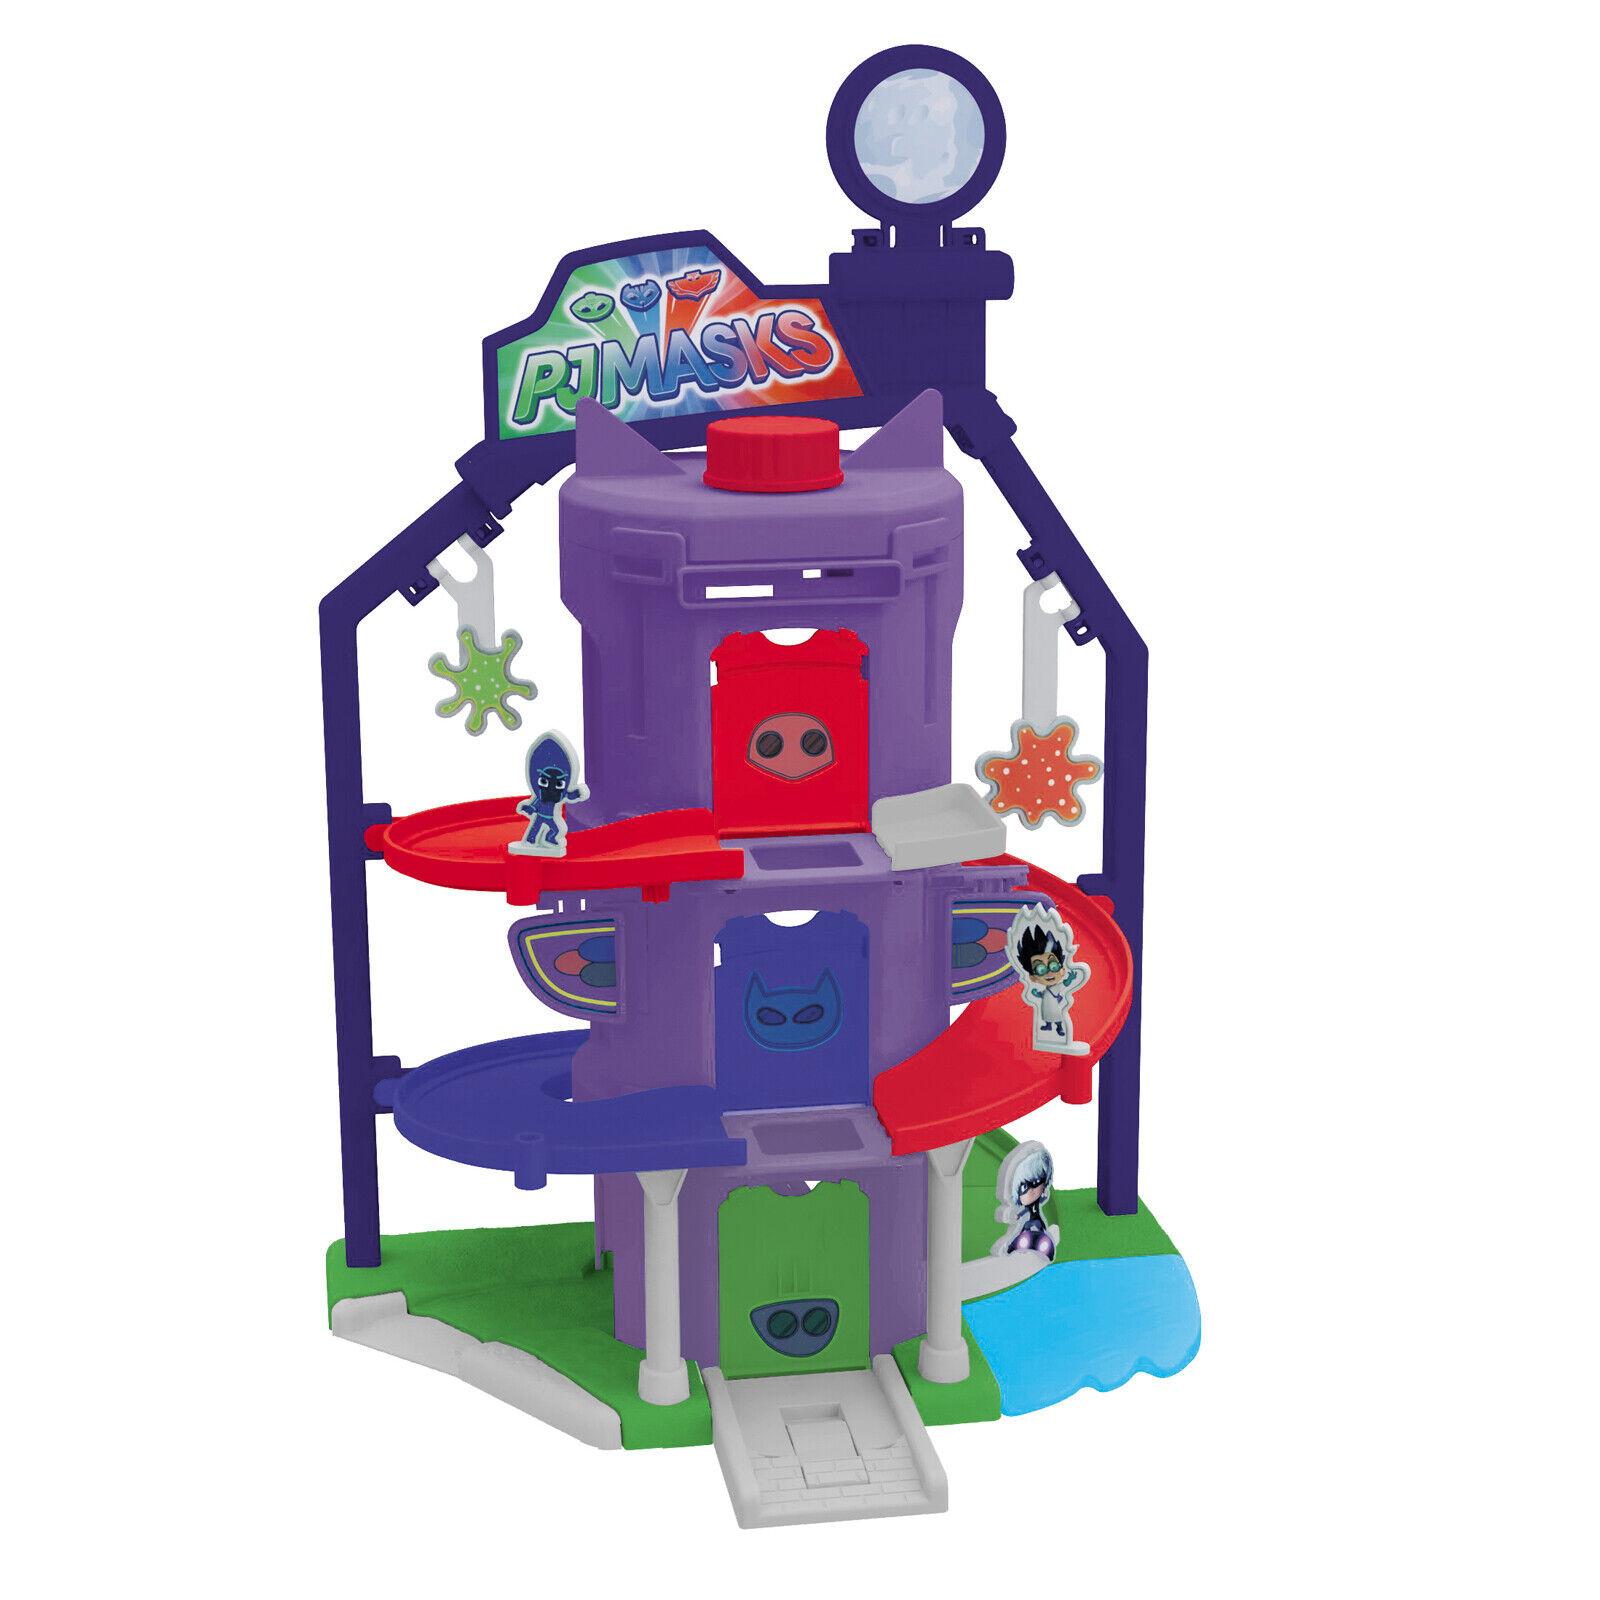 PJ Mask Headquarter Hauptquartier Catboy Spielzeug Figur PJ Masks Abenteuer Set